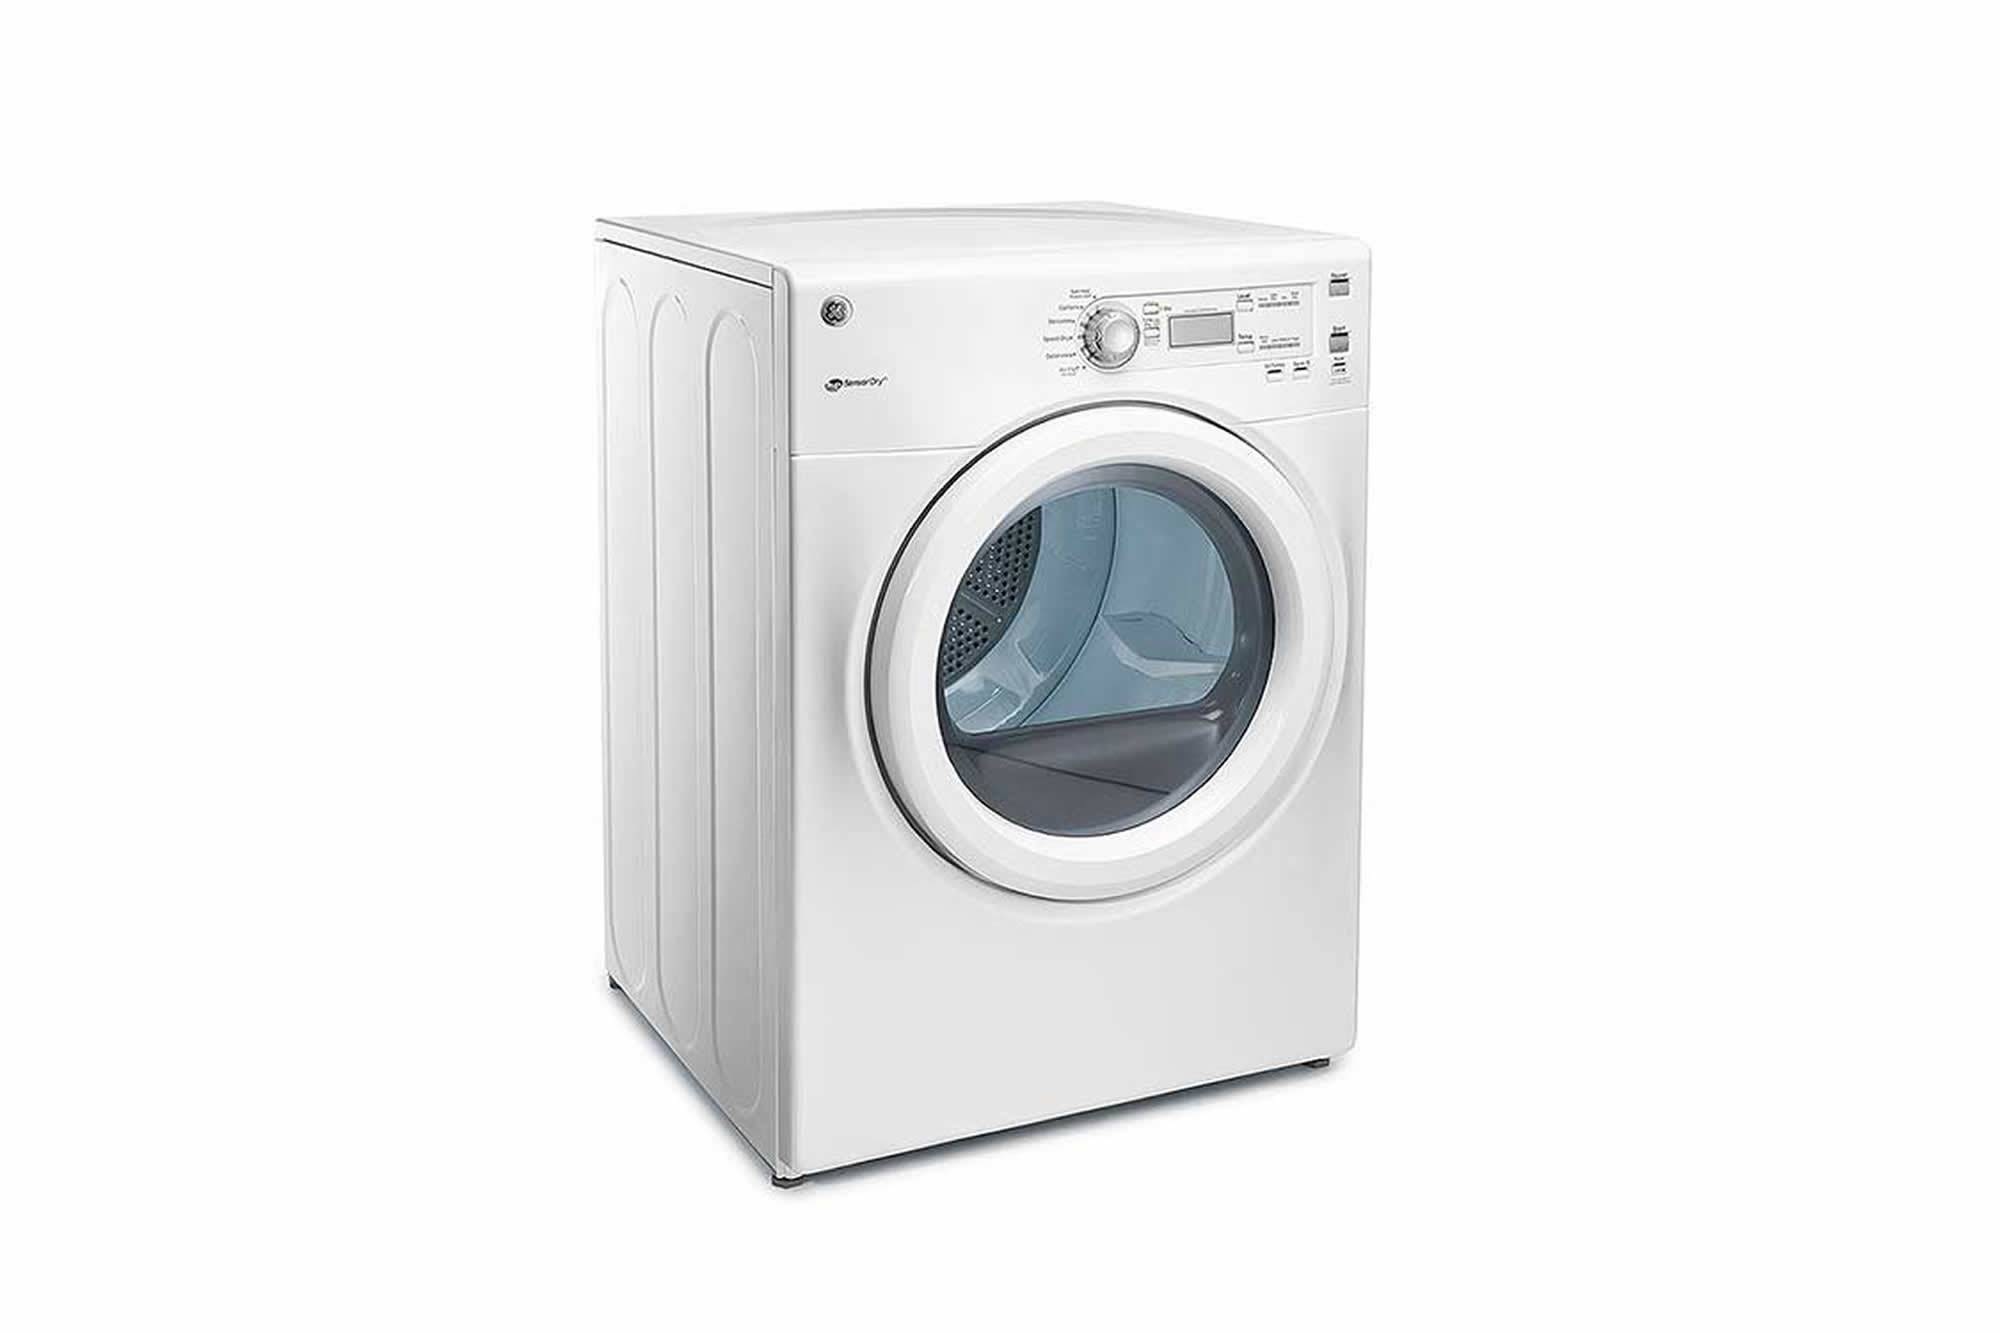 servicio tecnico de secadoras bosch